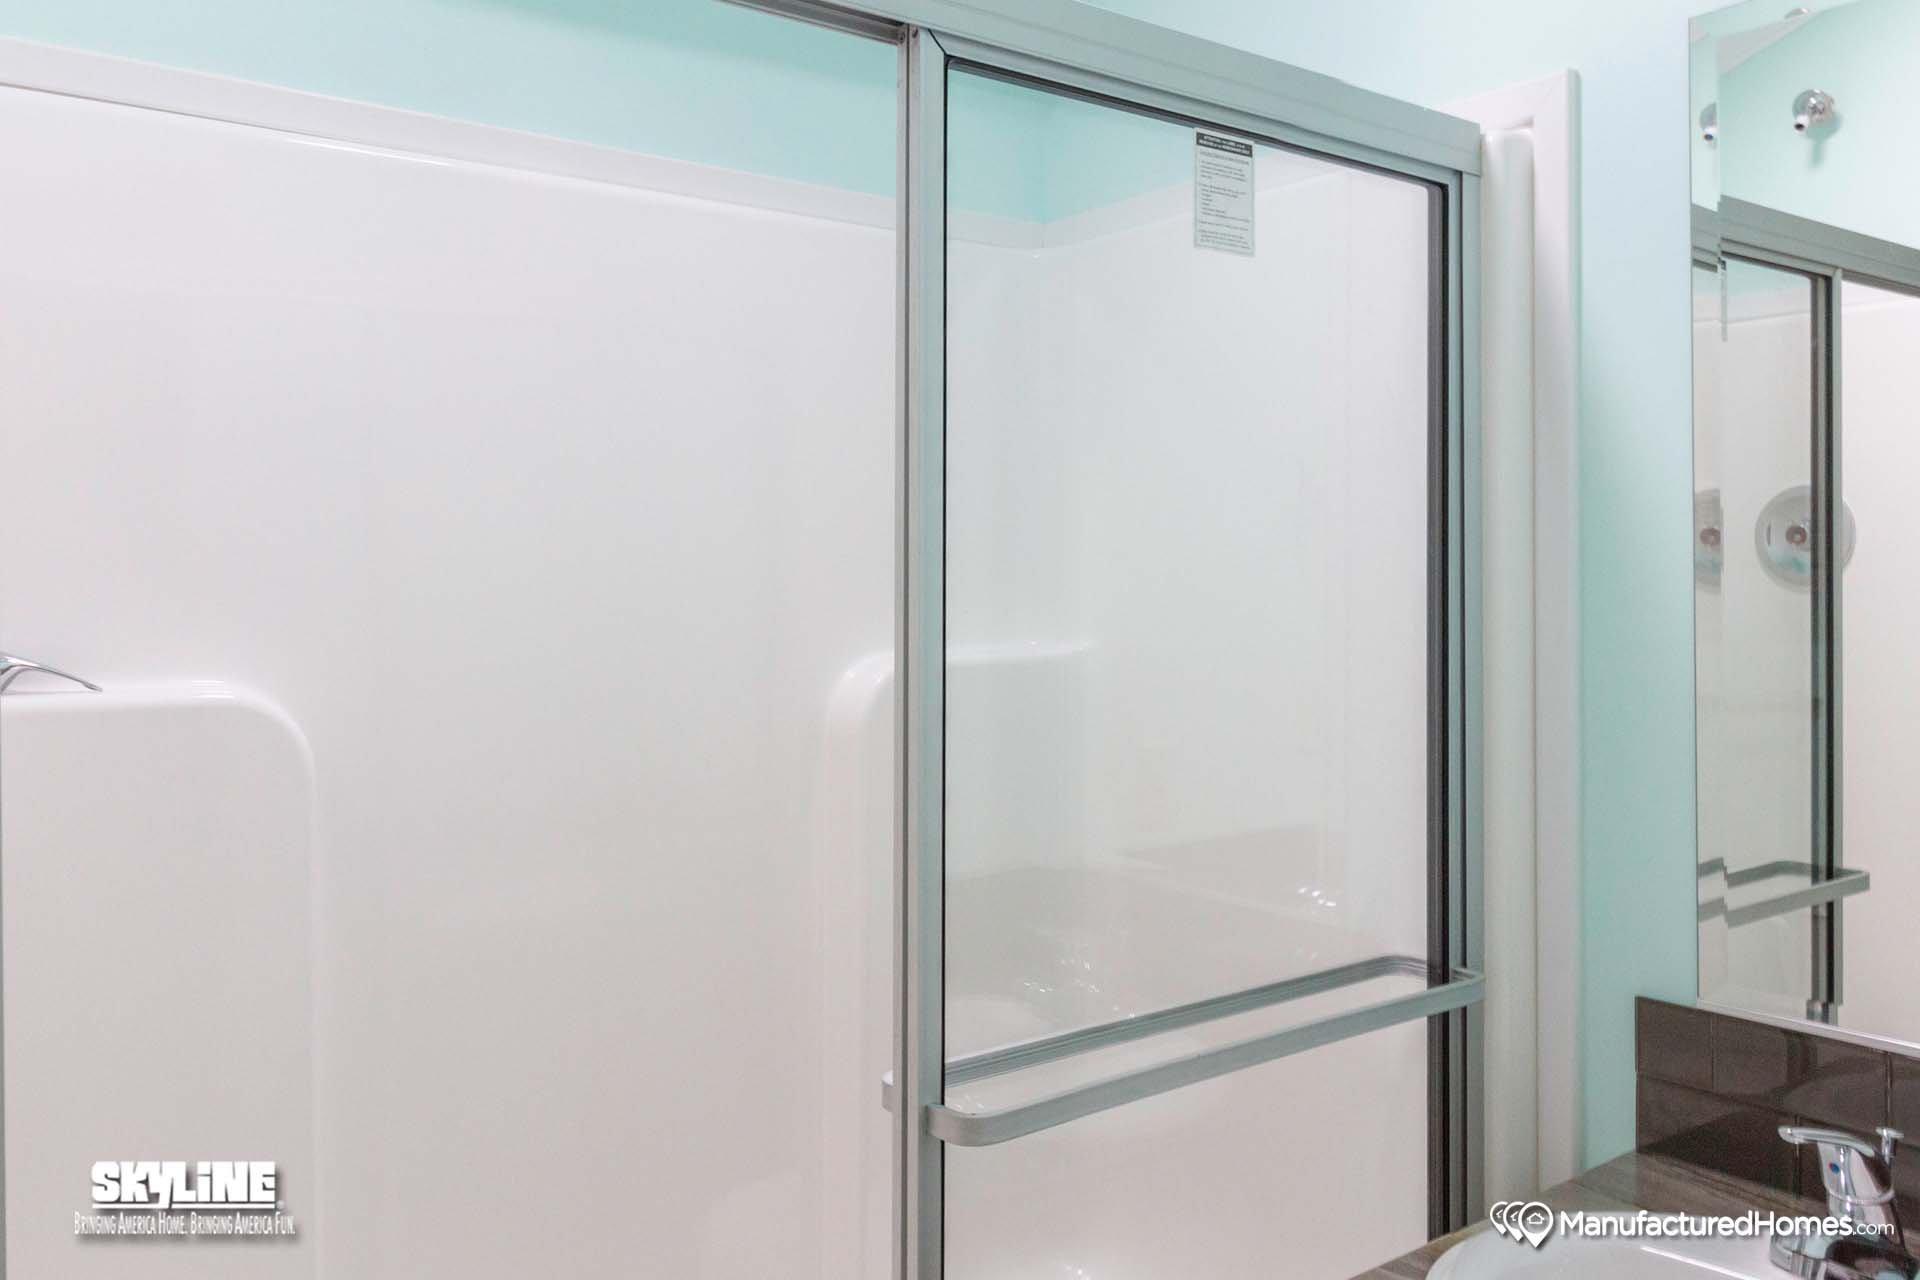 repairrhtoday with glass rhabsolutecom doors and frameless we rv buttress install custom door absolute shower